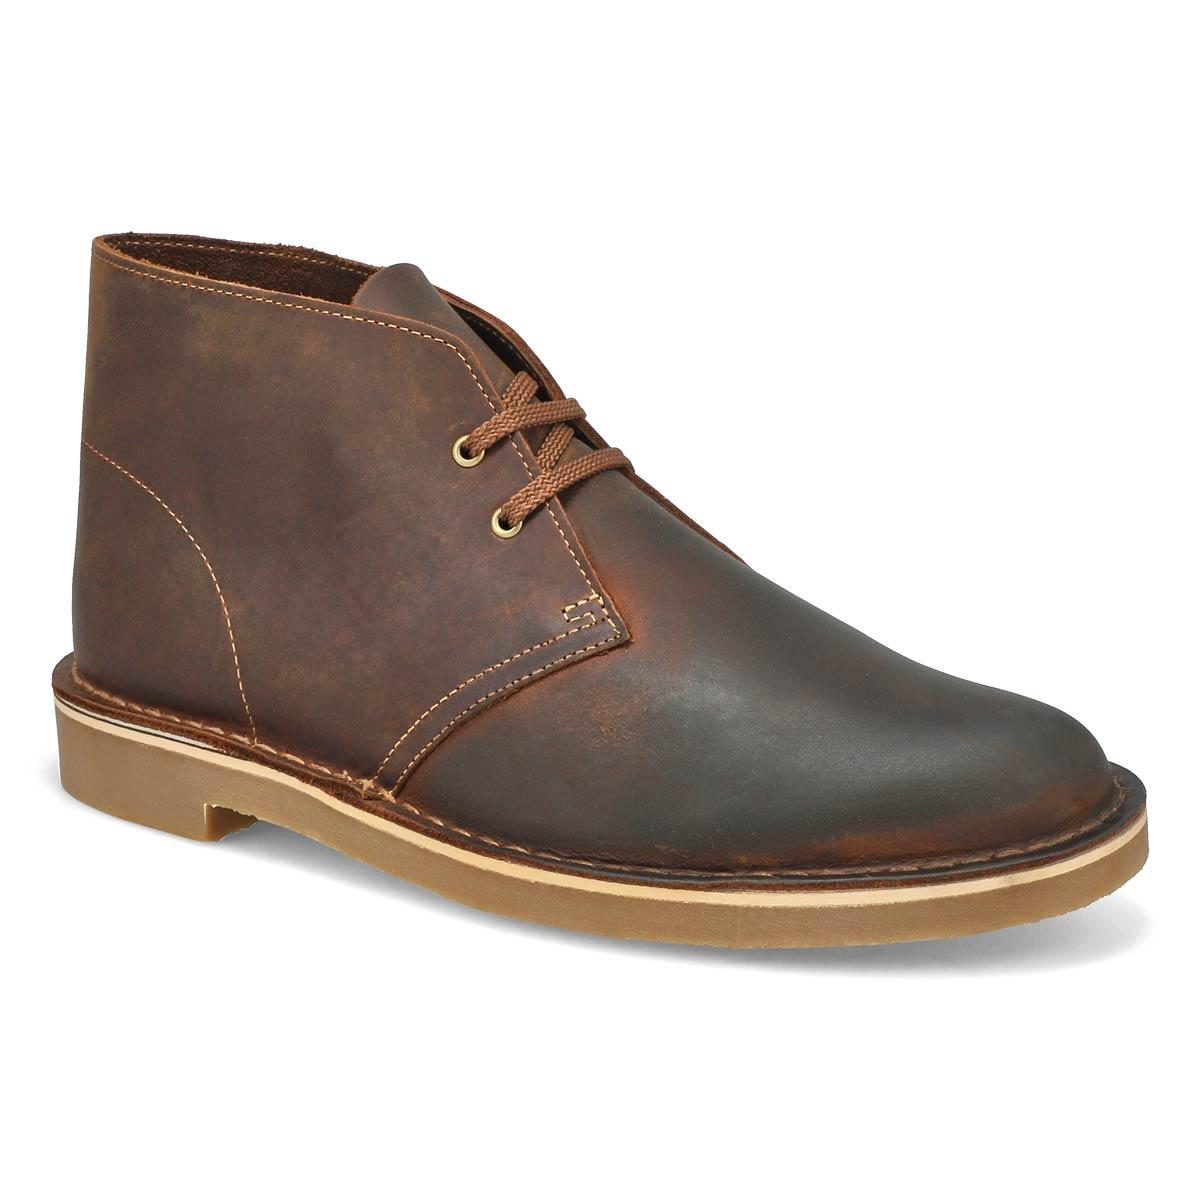 Men's Bushacre 3 Beeswax Desert Boot Wide